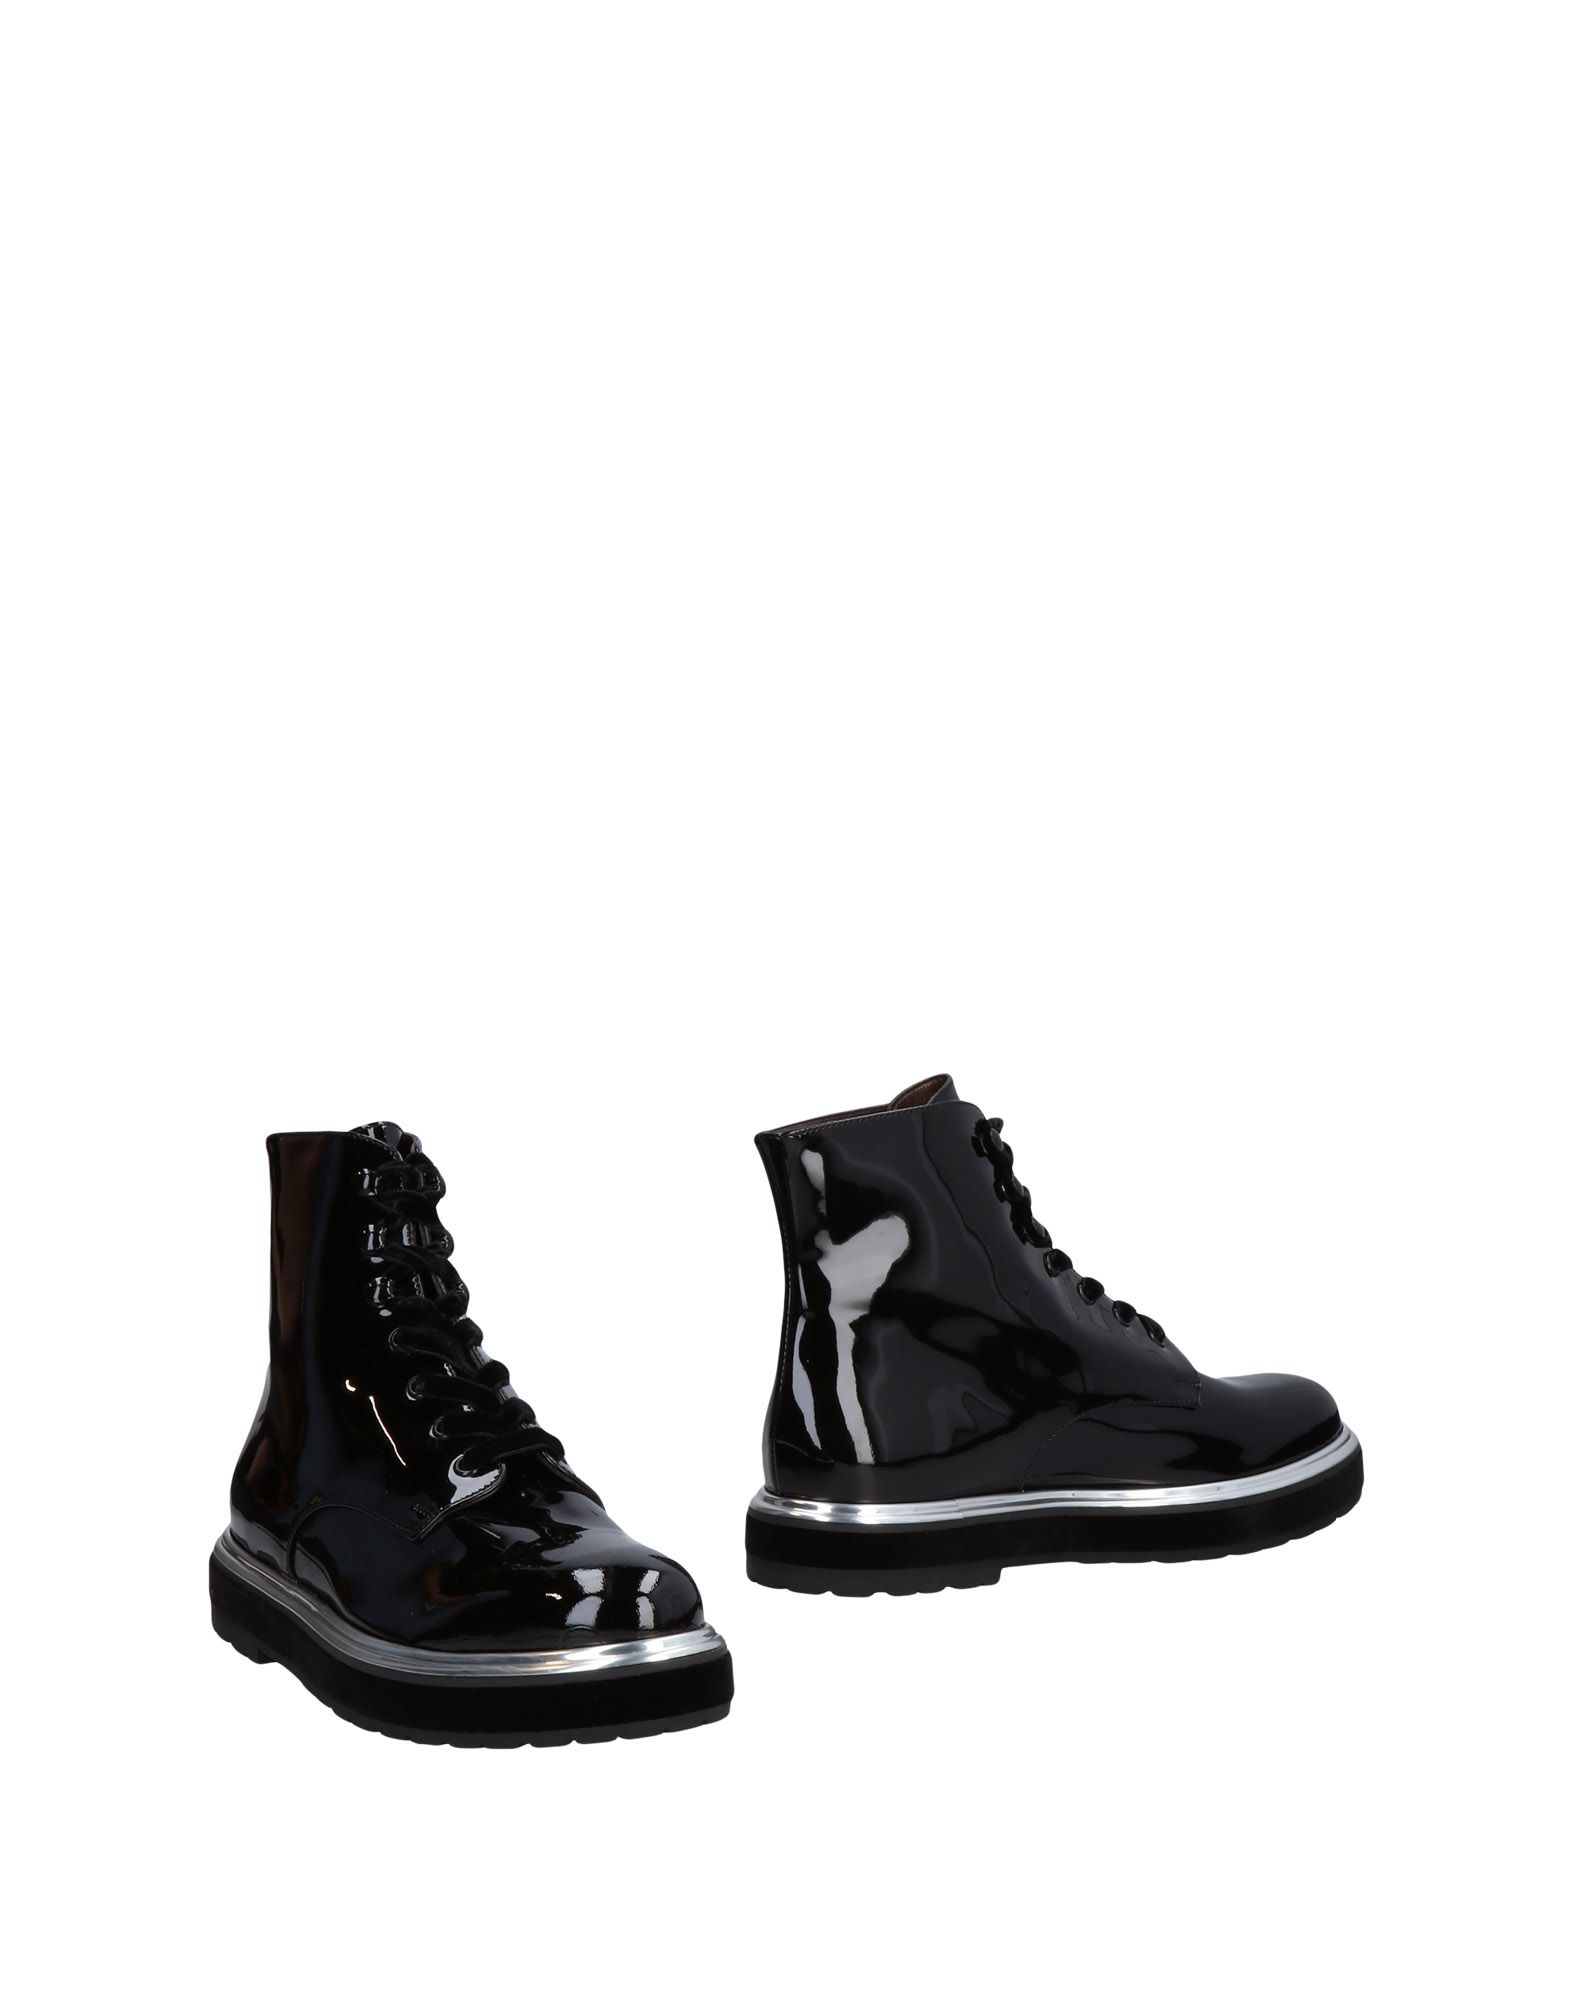 Agl Attilio Giusti Leombruni Ankle Boot - Women Women - Agl Attilio Giusti Leombruni Ankle Boots online on  Australia - 11470173JW ae8597